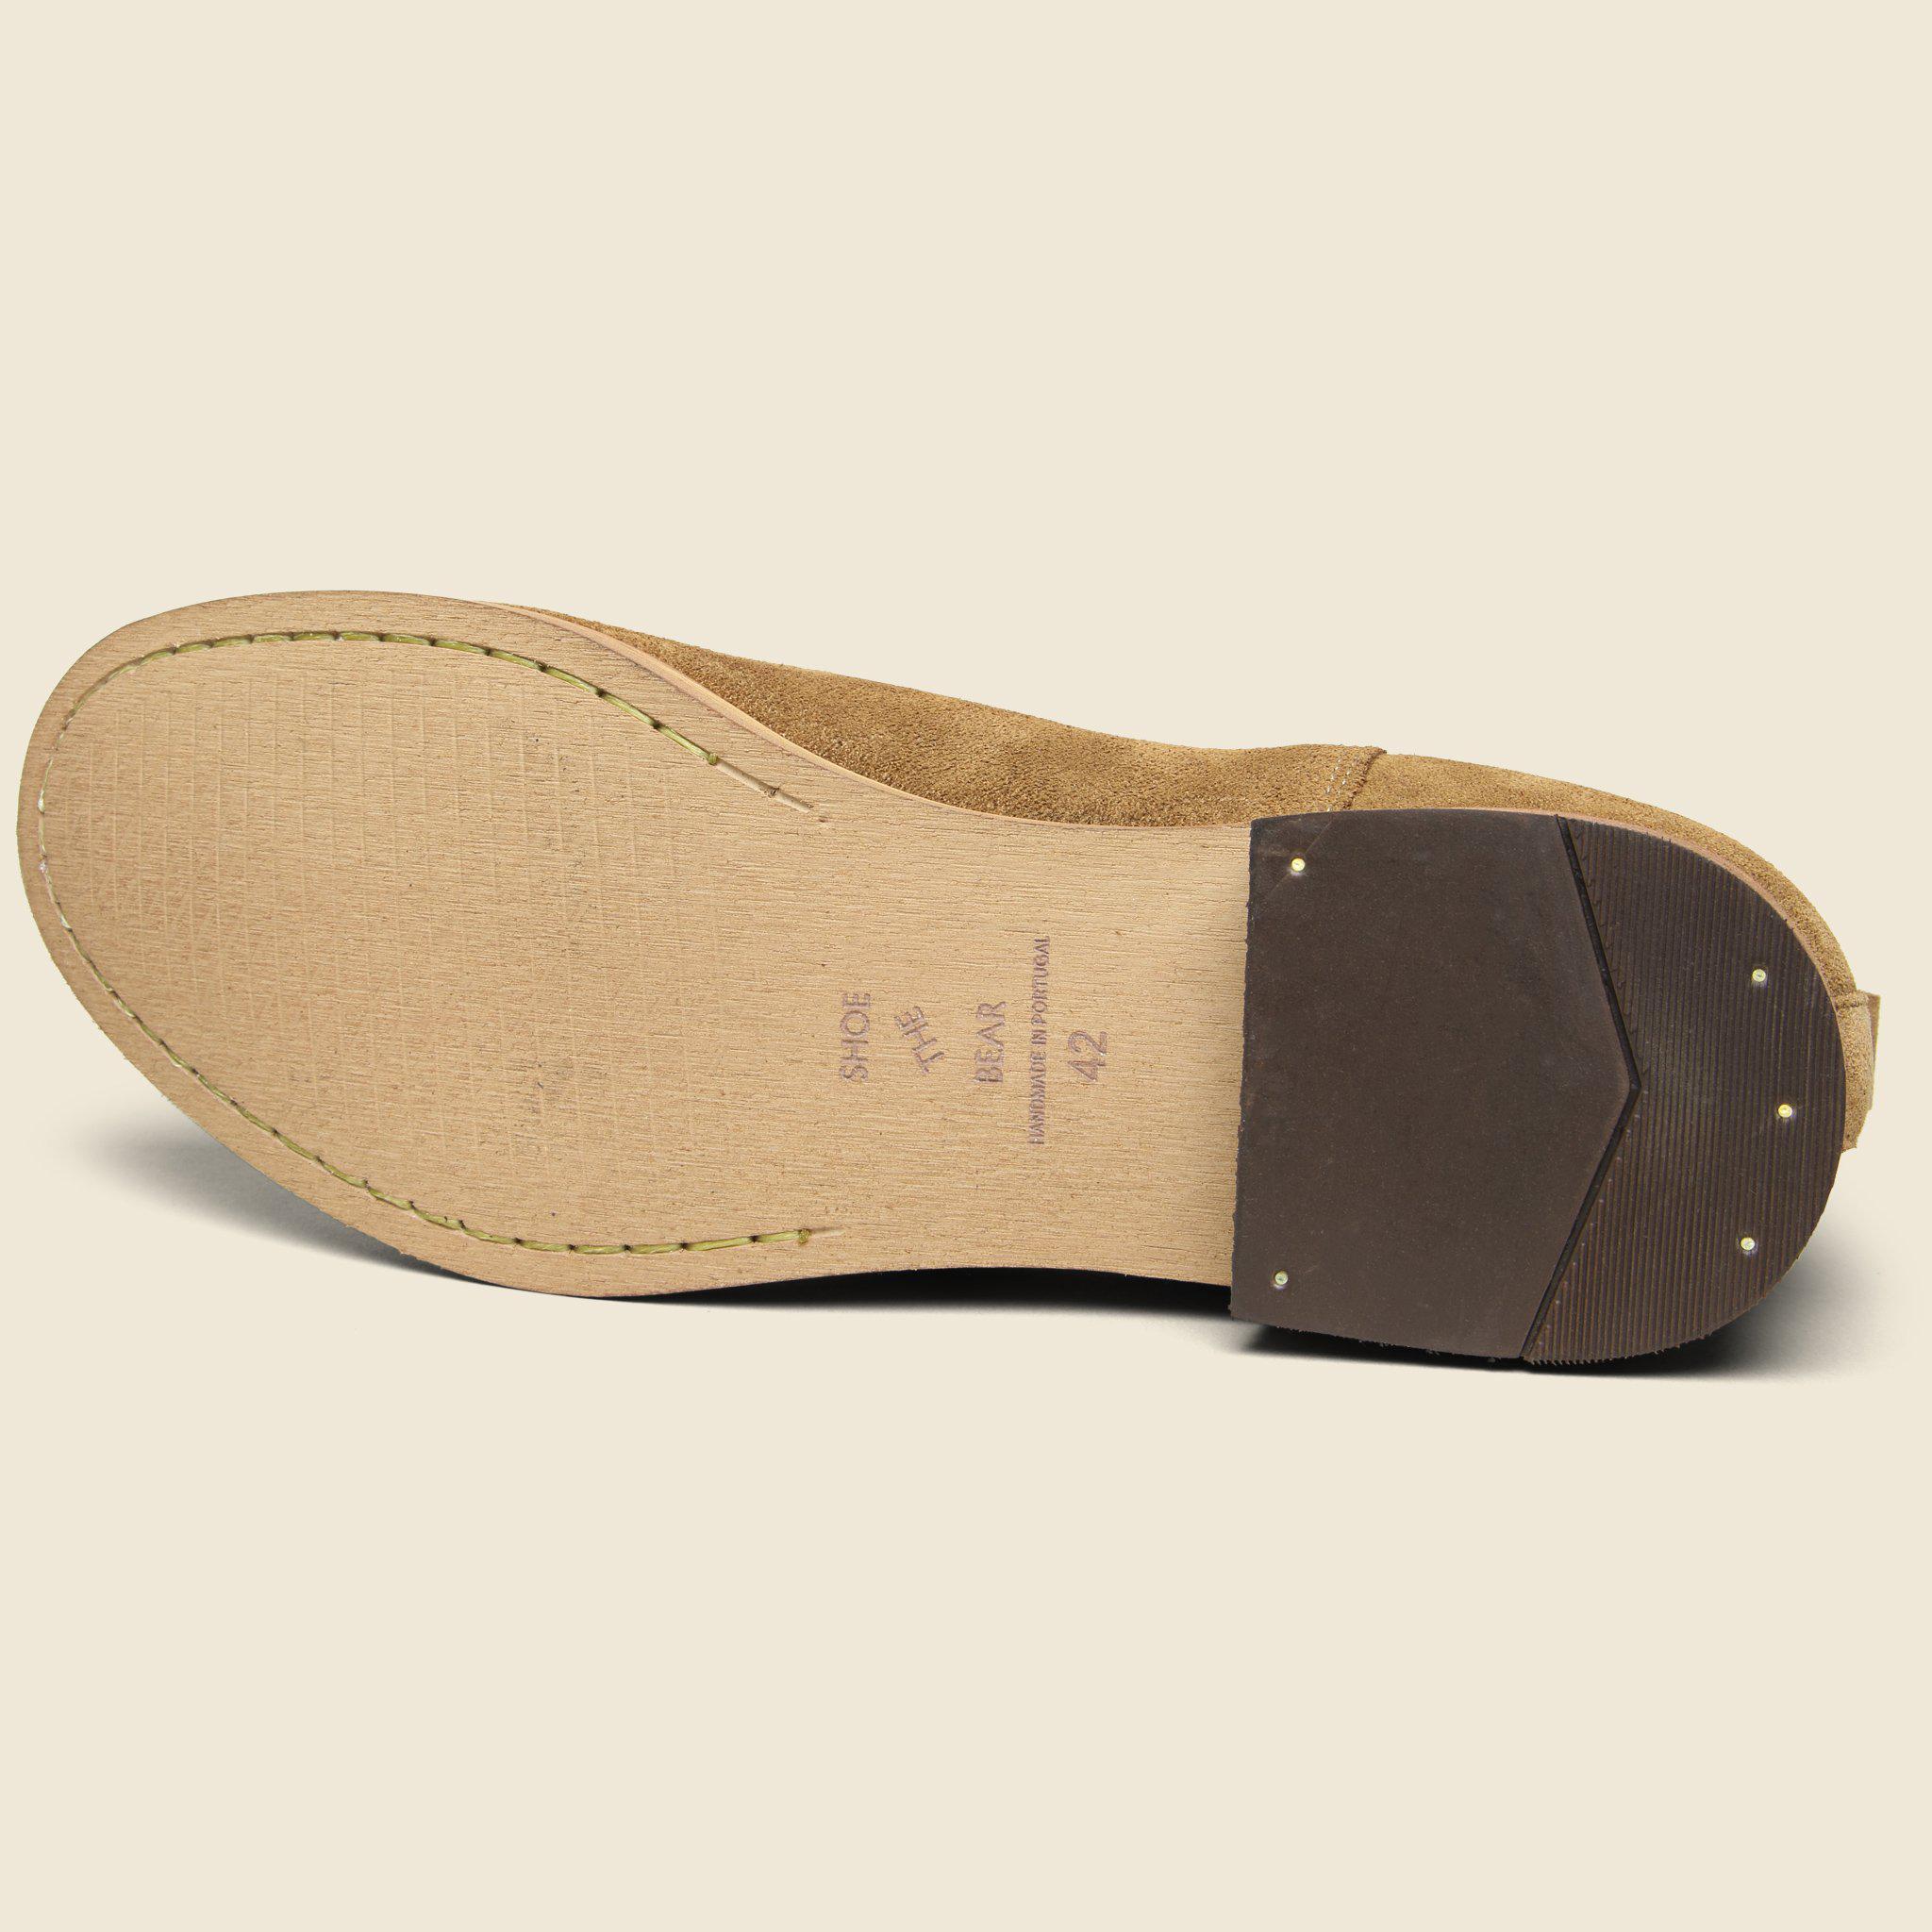 4f29385de071 Lyst - Shoe The Bear Dev Suede Chelsea Boot - Light Brown in Brown ...